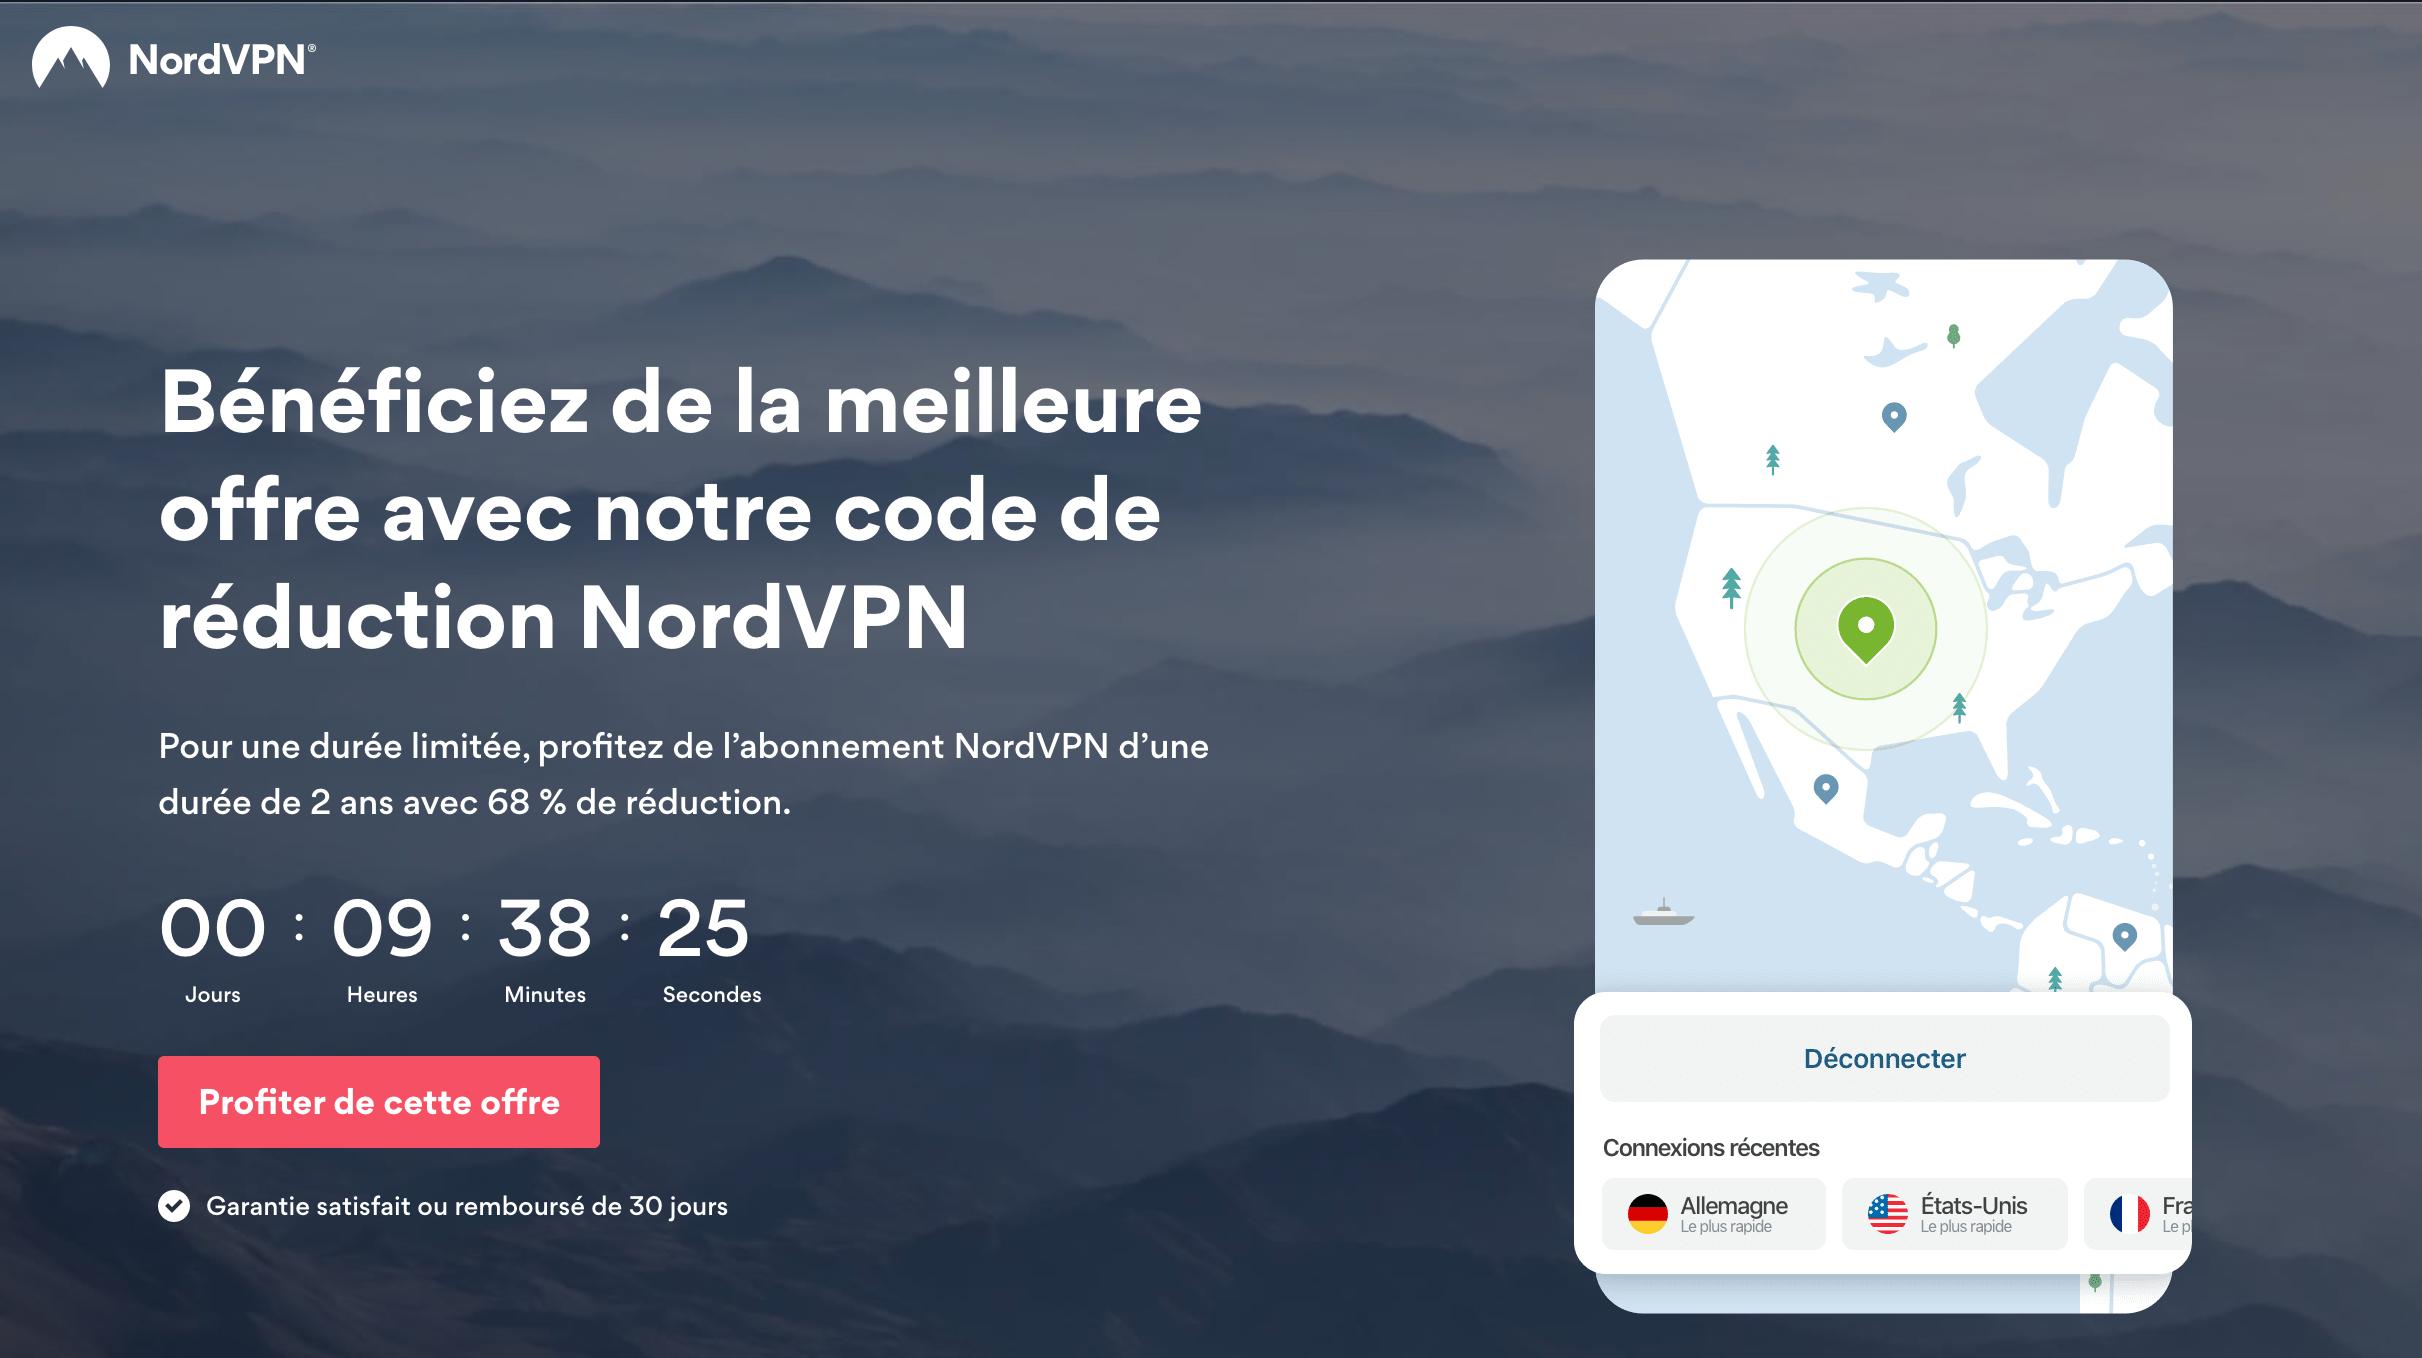 NordVPN à -68% pendant 2ans grâce au code promo tipsfromgeeks